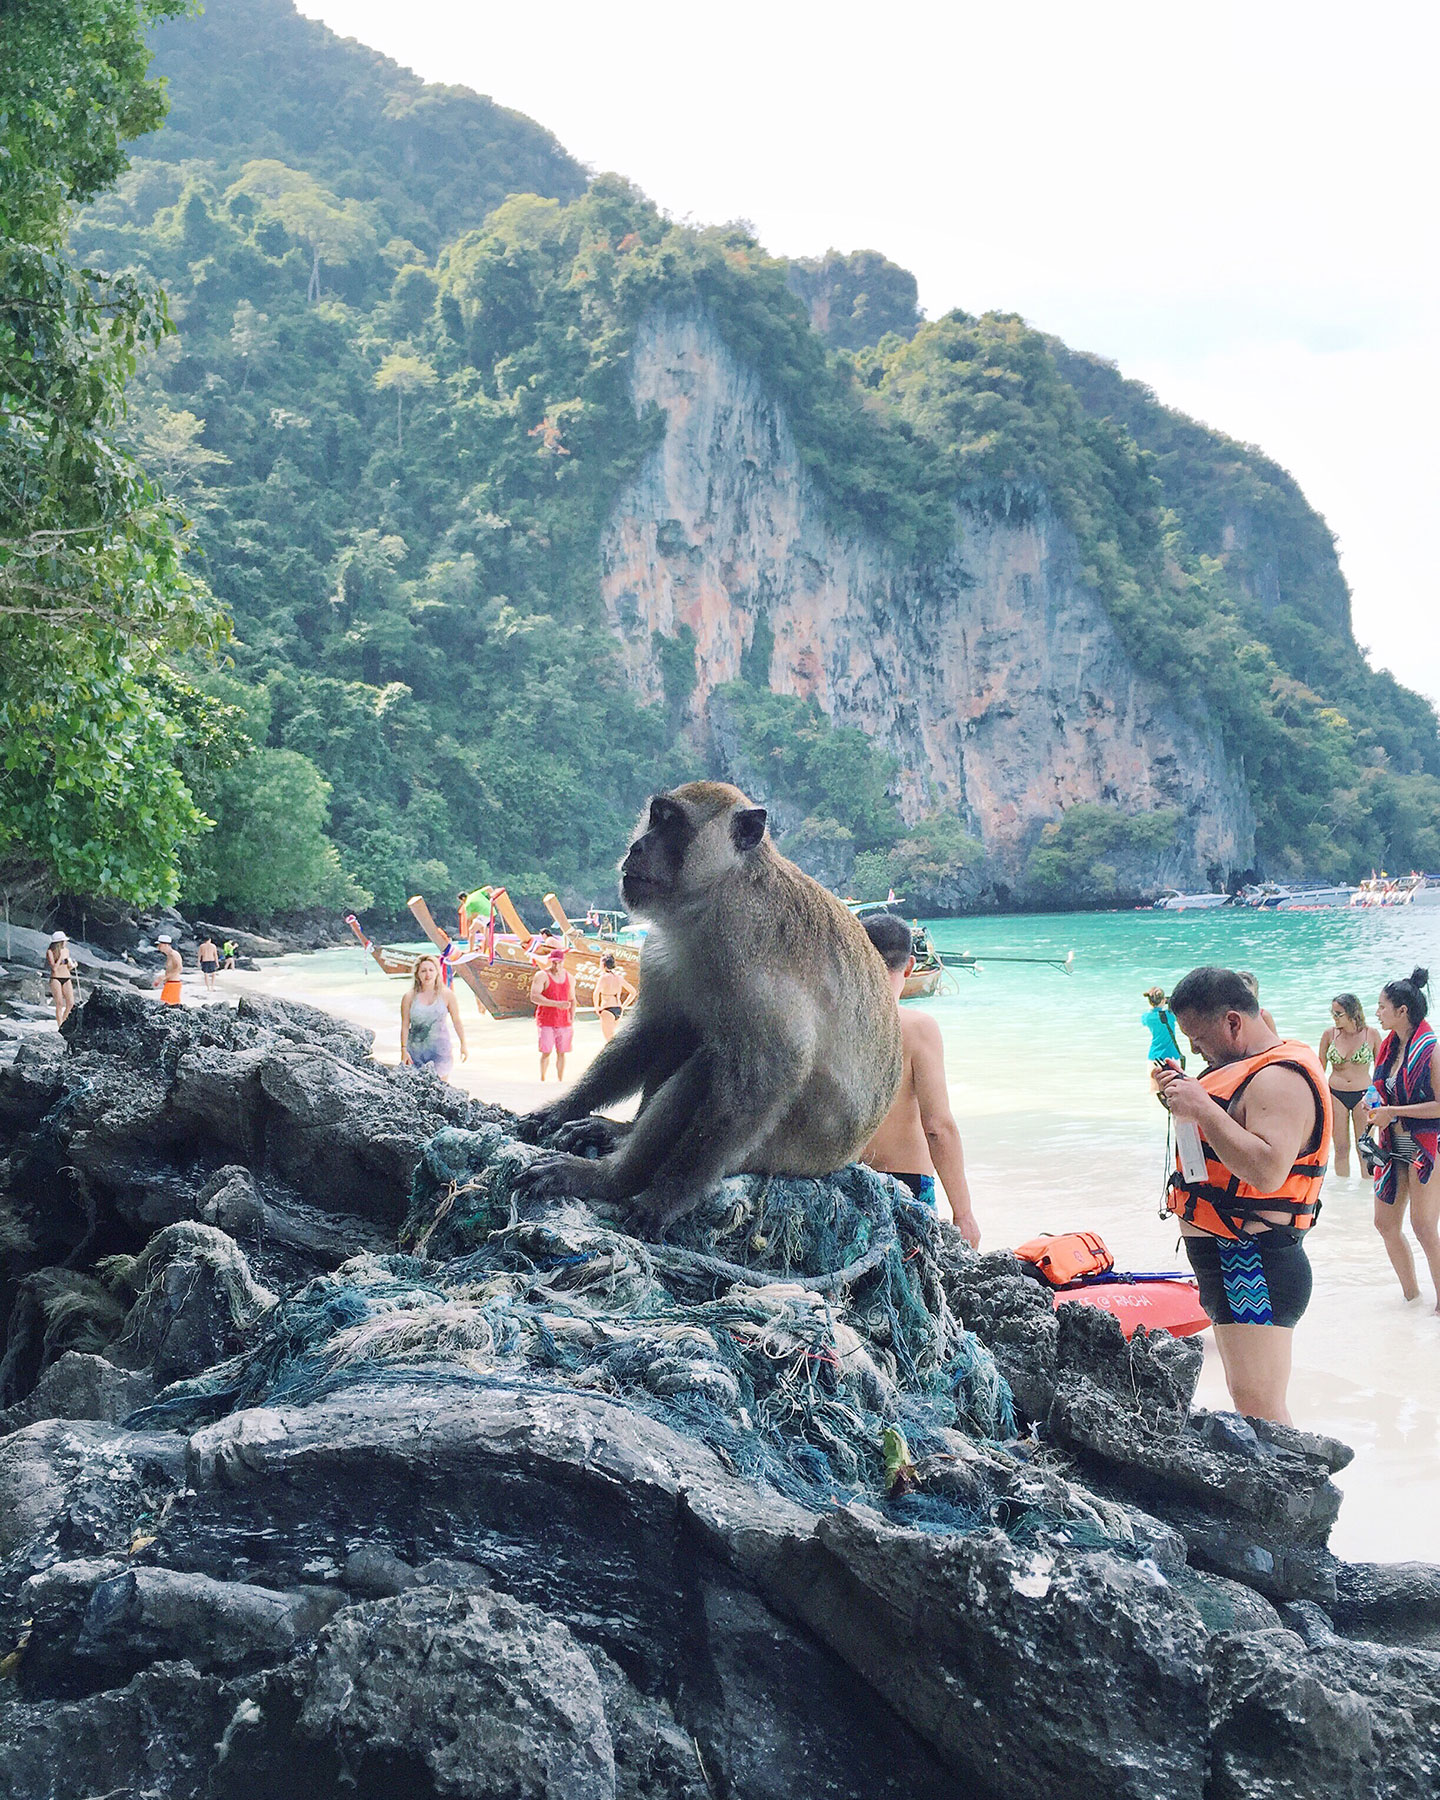 Monkey beach in the Phi Phi Islands